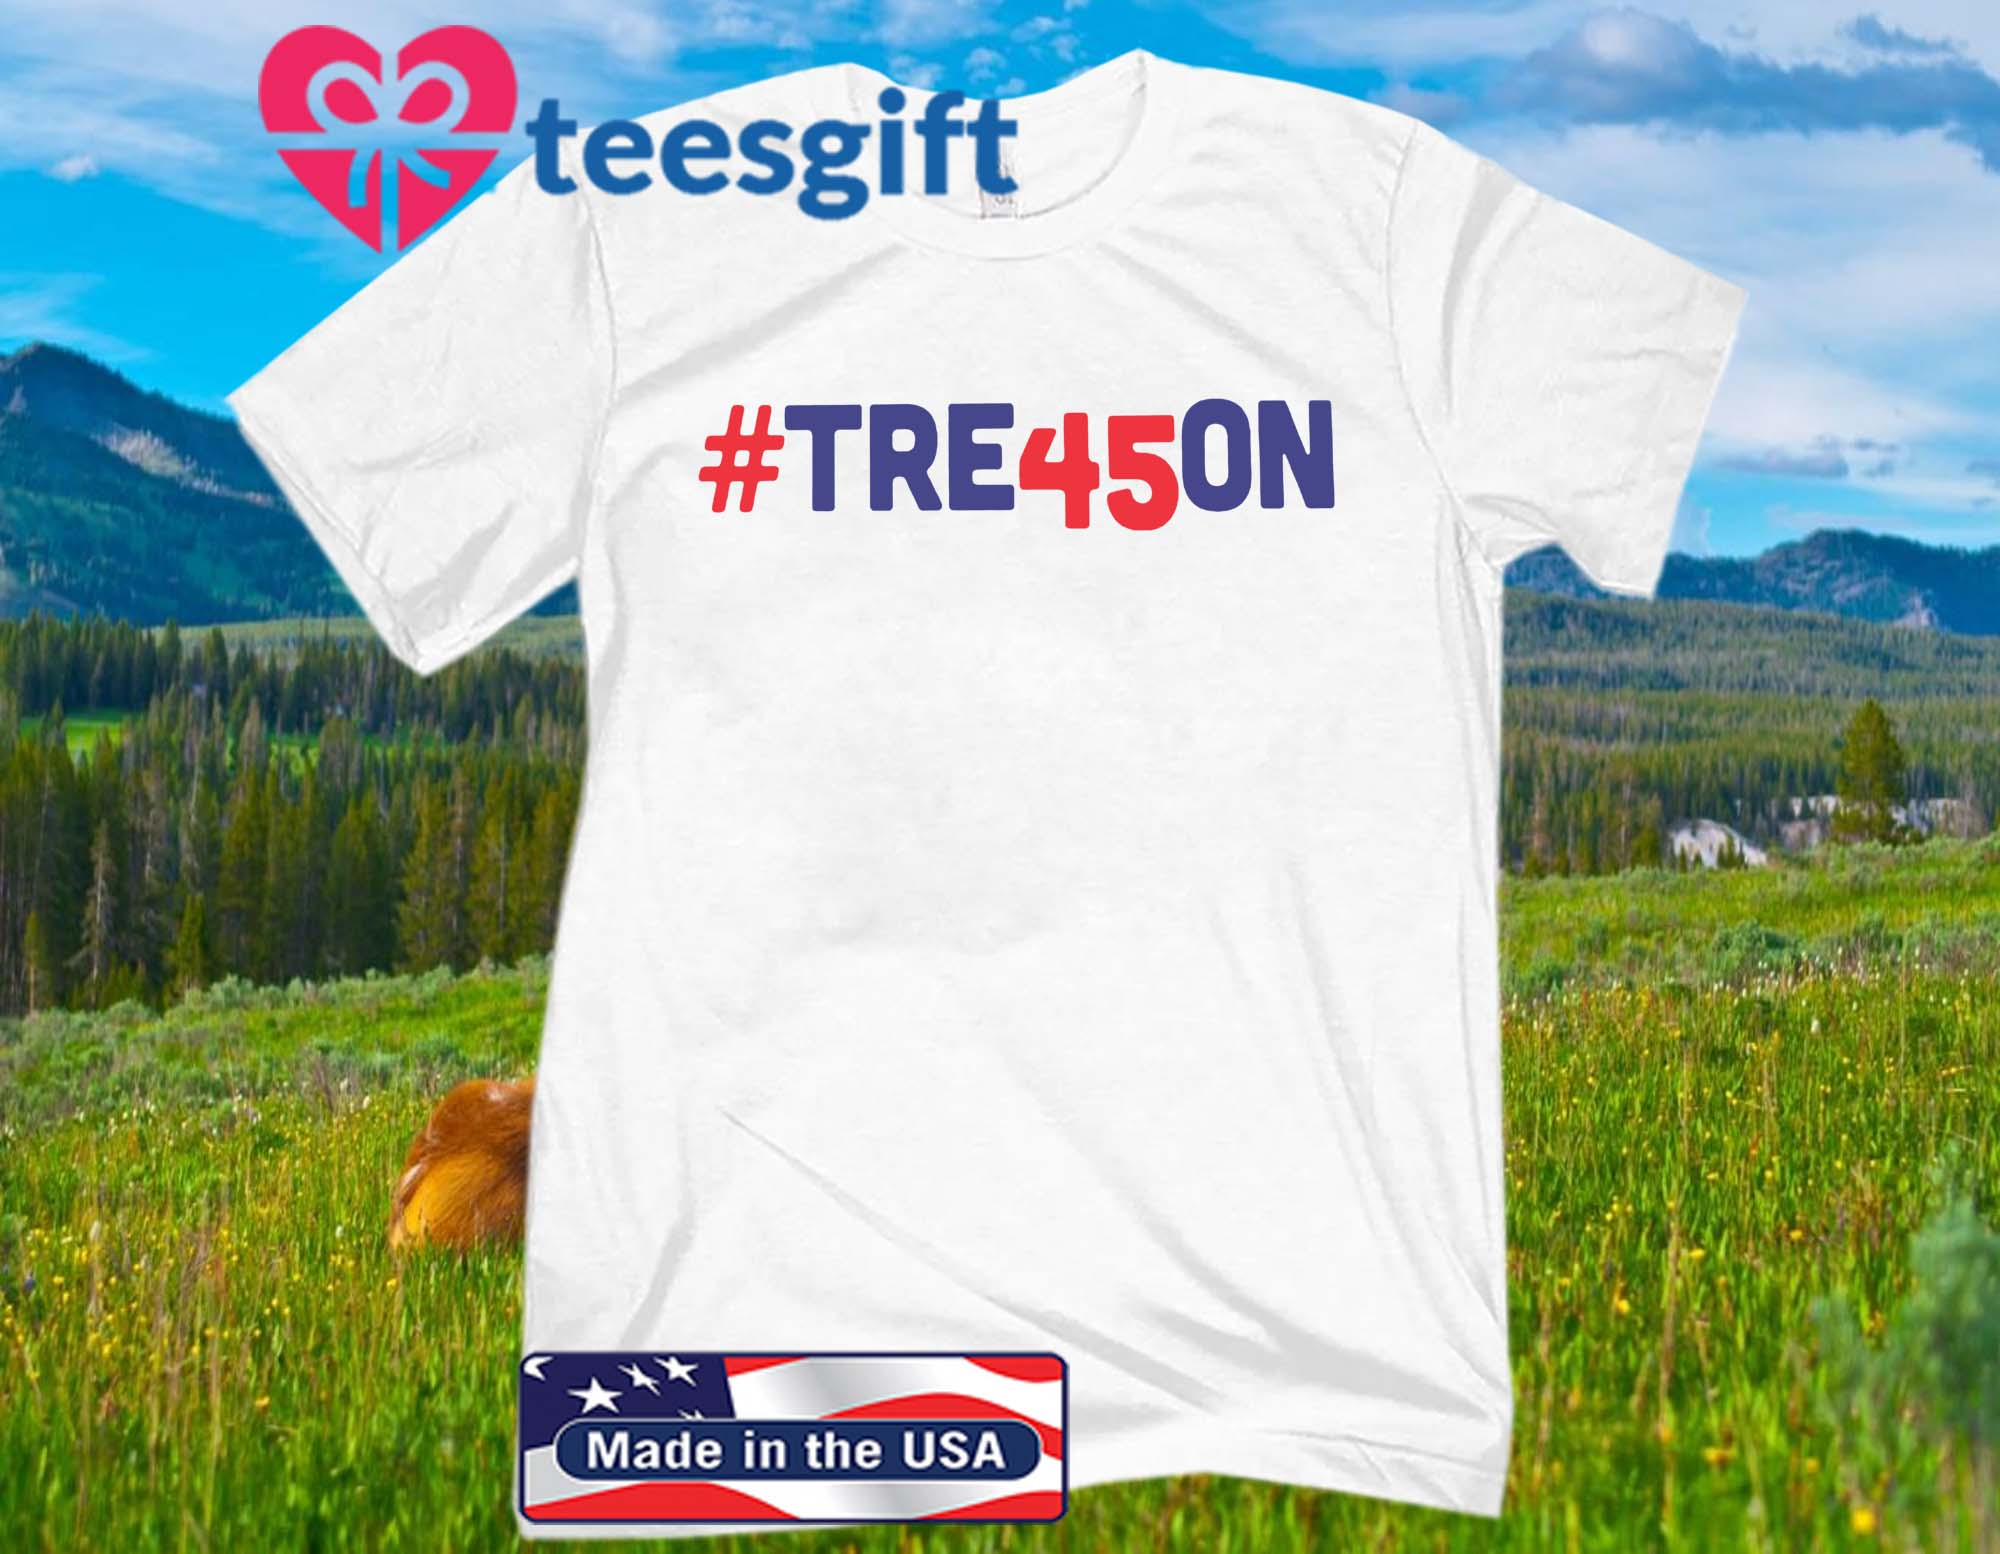 #TRE45ON T-SHIRT UNITED STATES